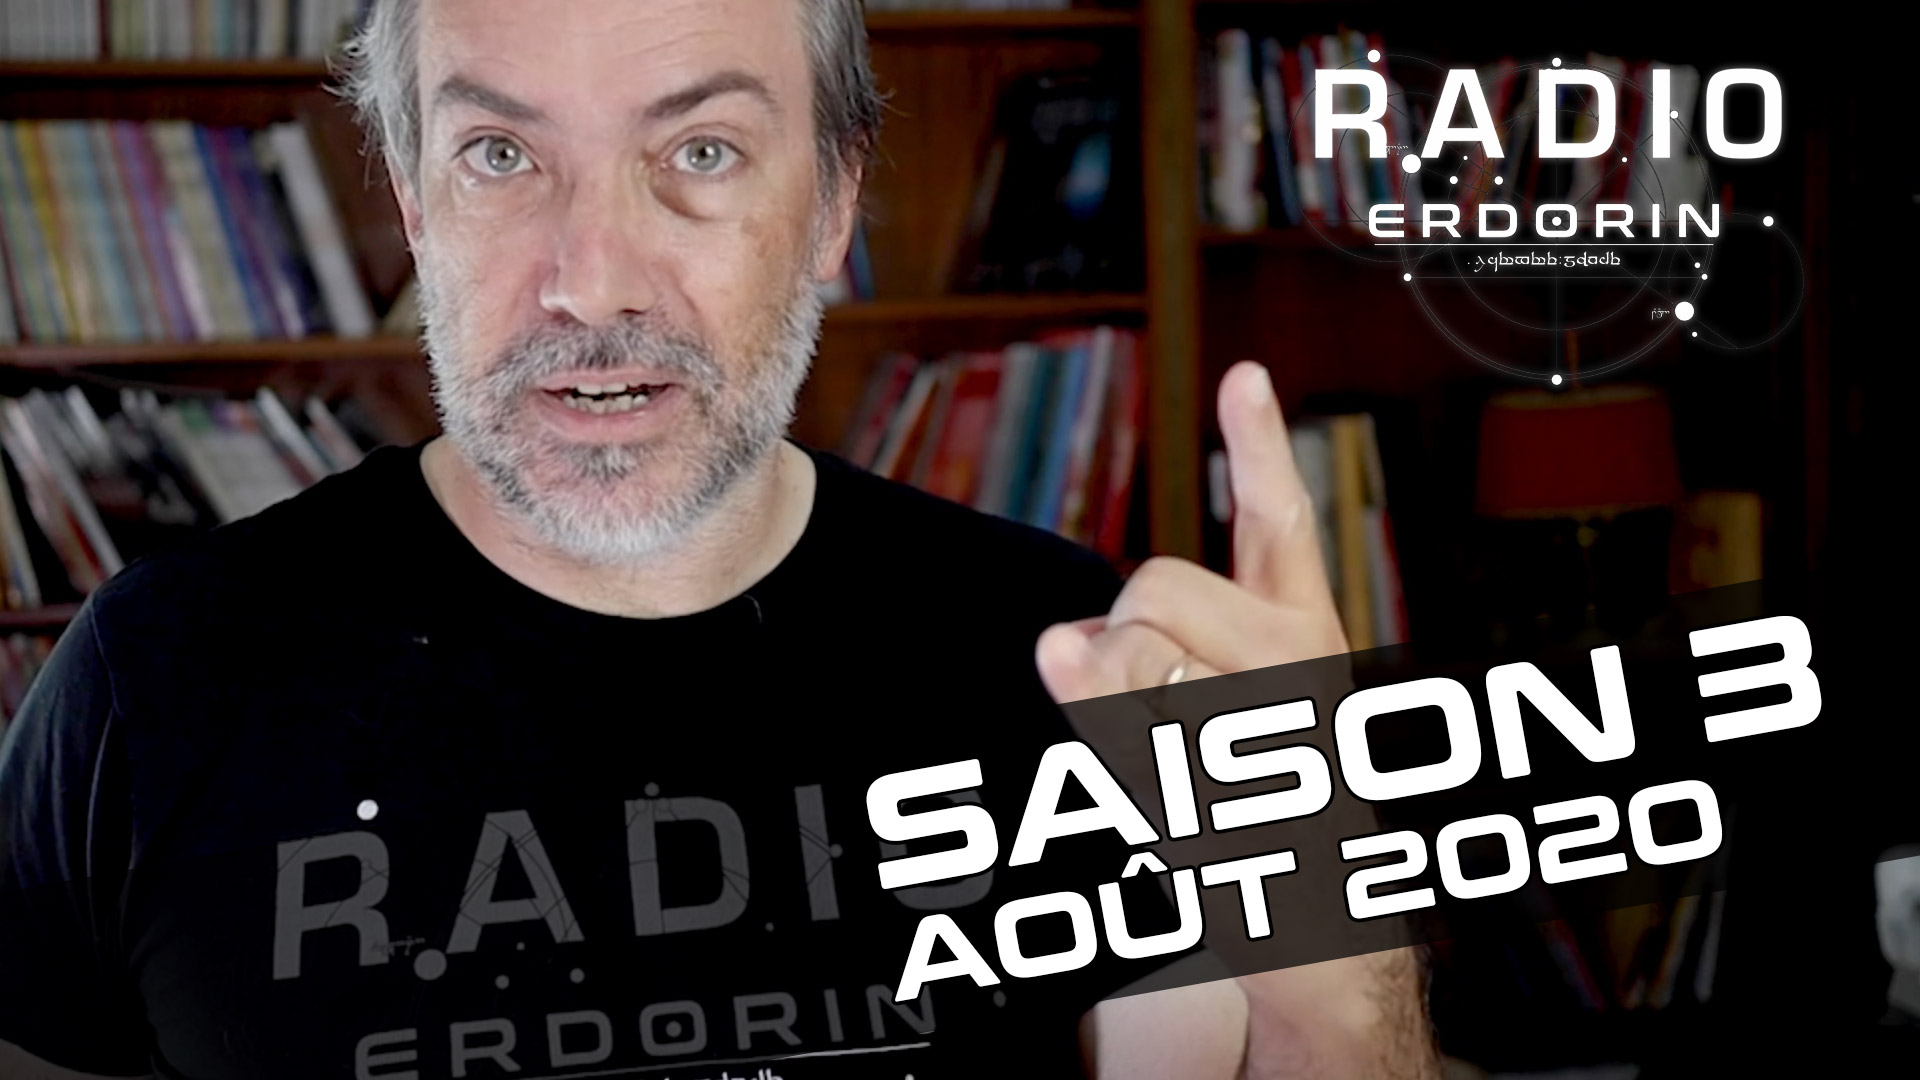 Radio-Erdorin S3E8 - Août 2020